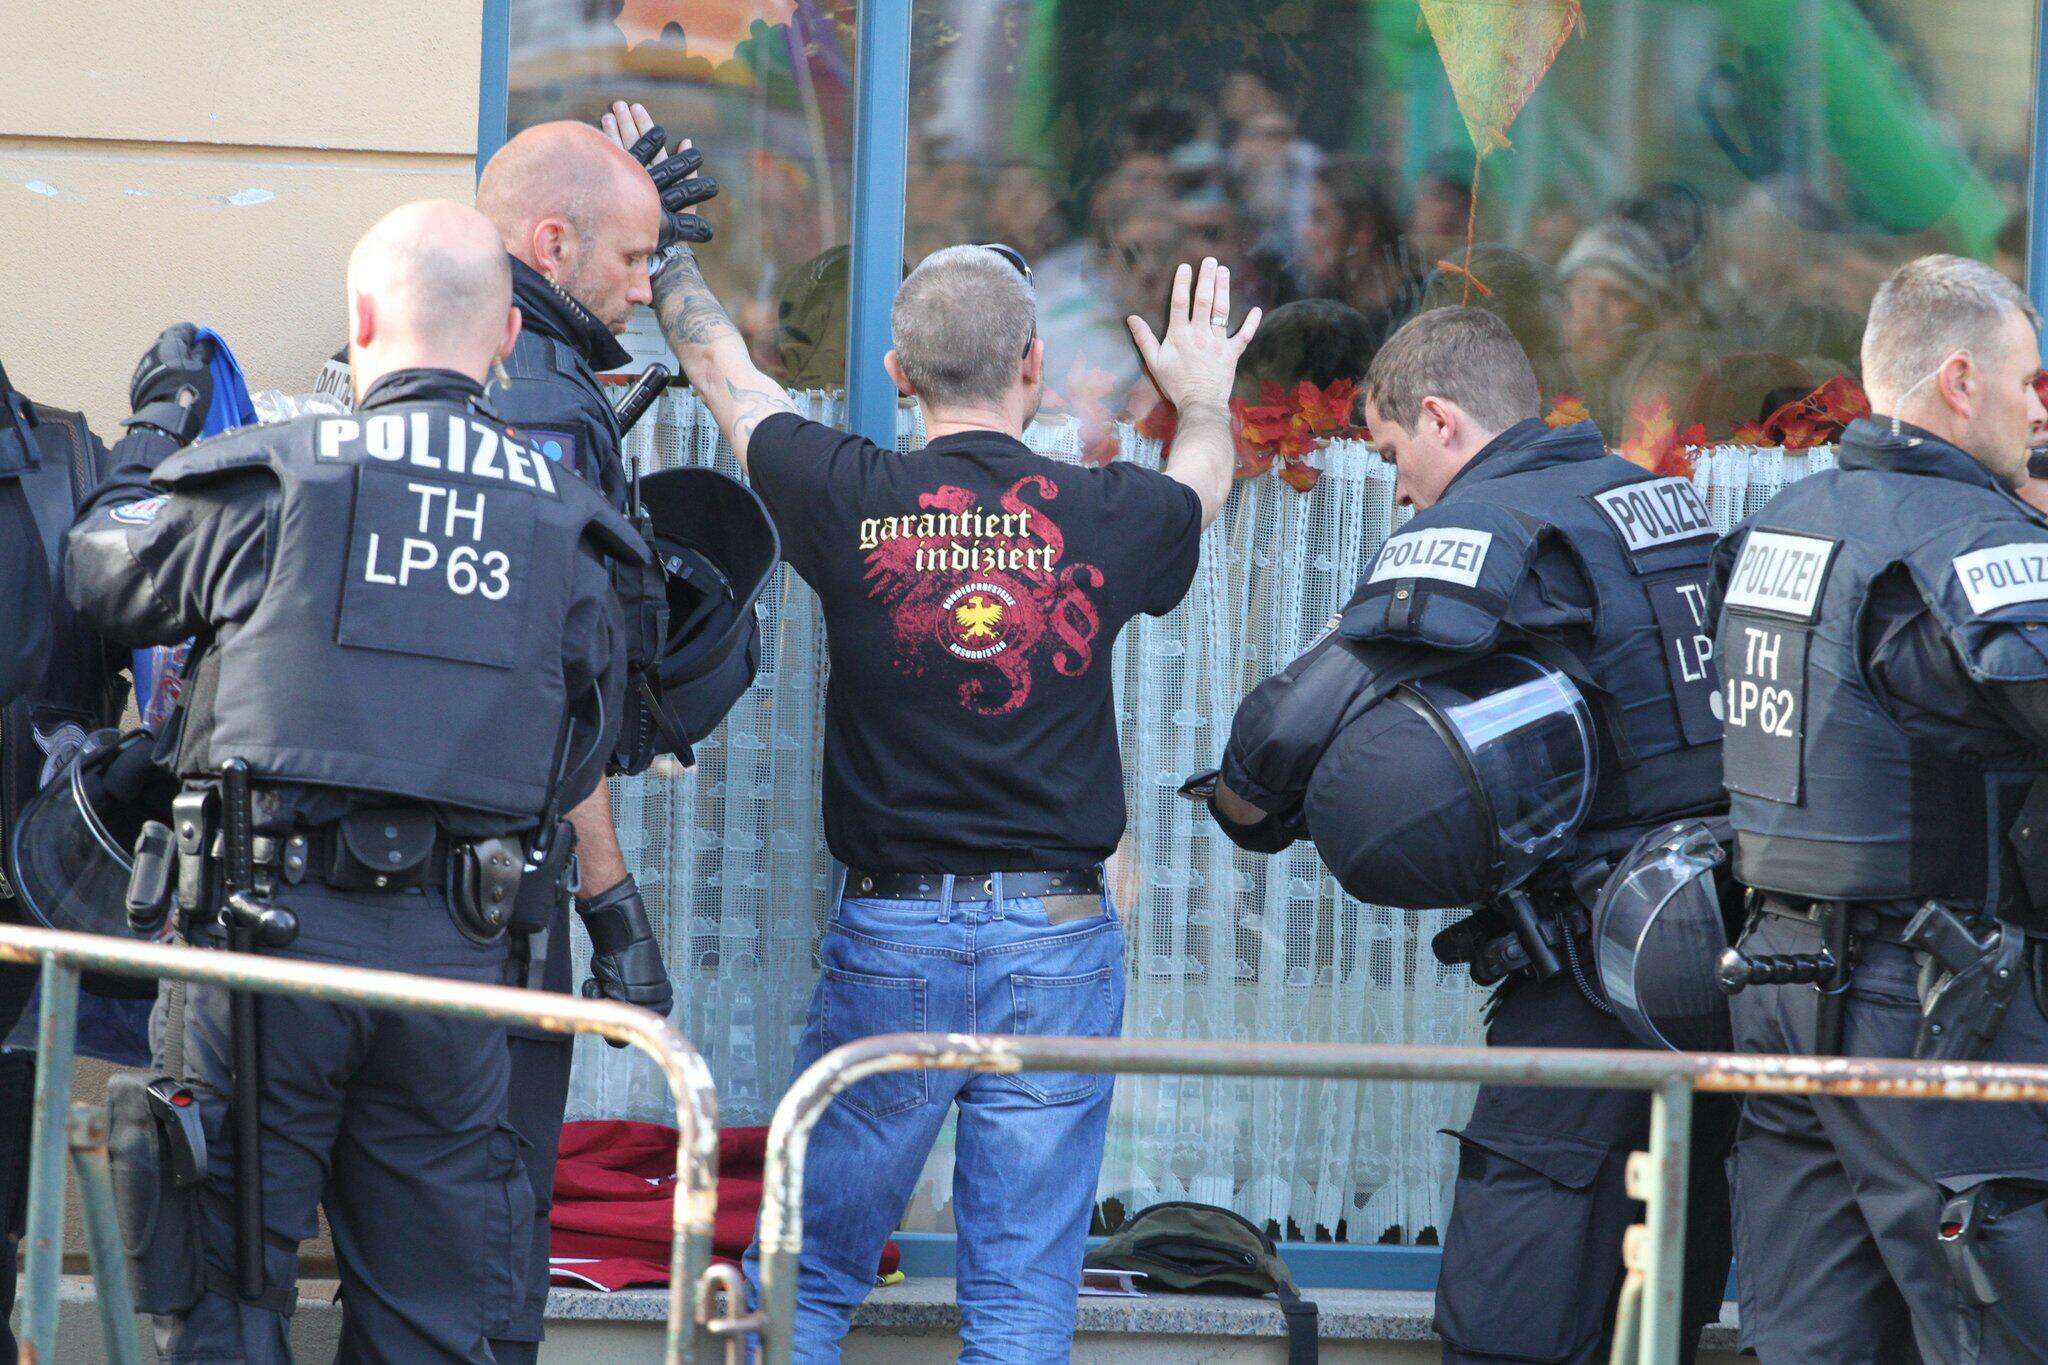 Bild zu Rechtsrock-Konzert in Thüringen